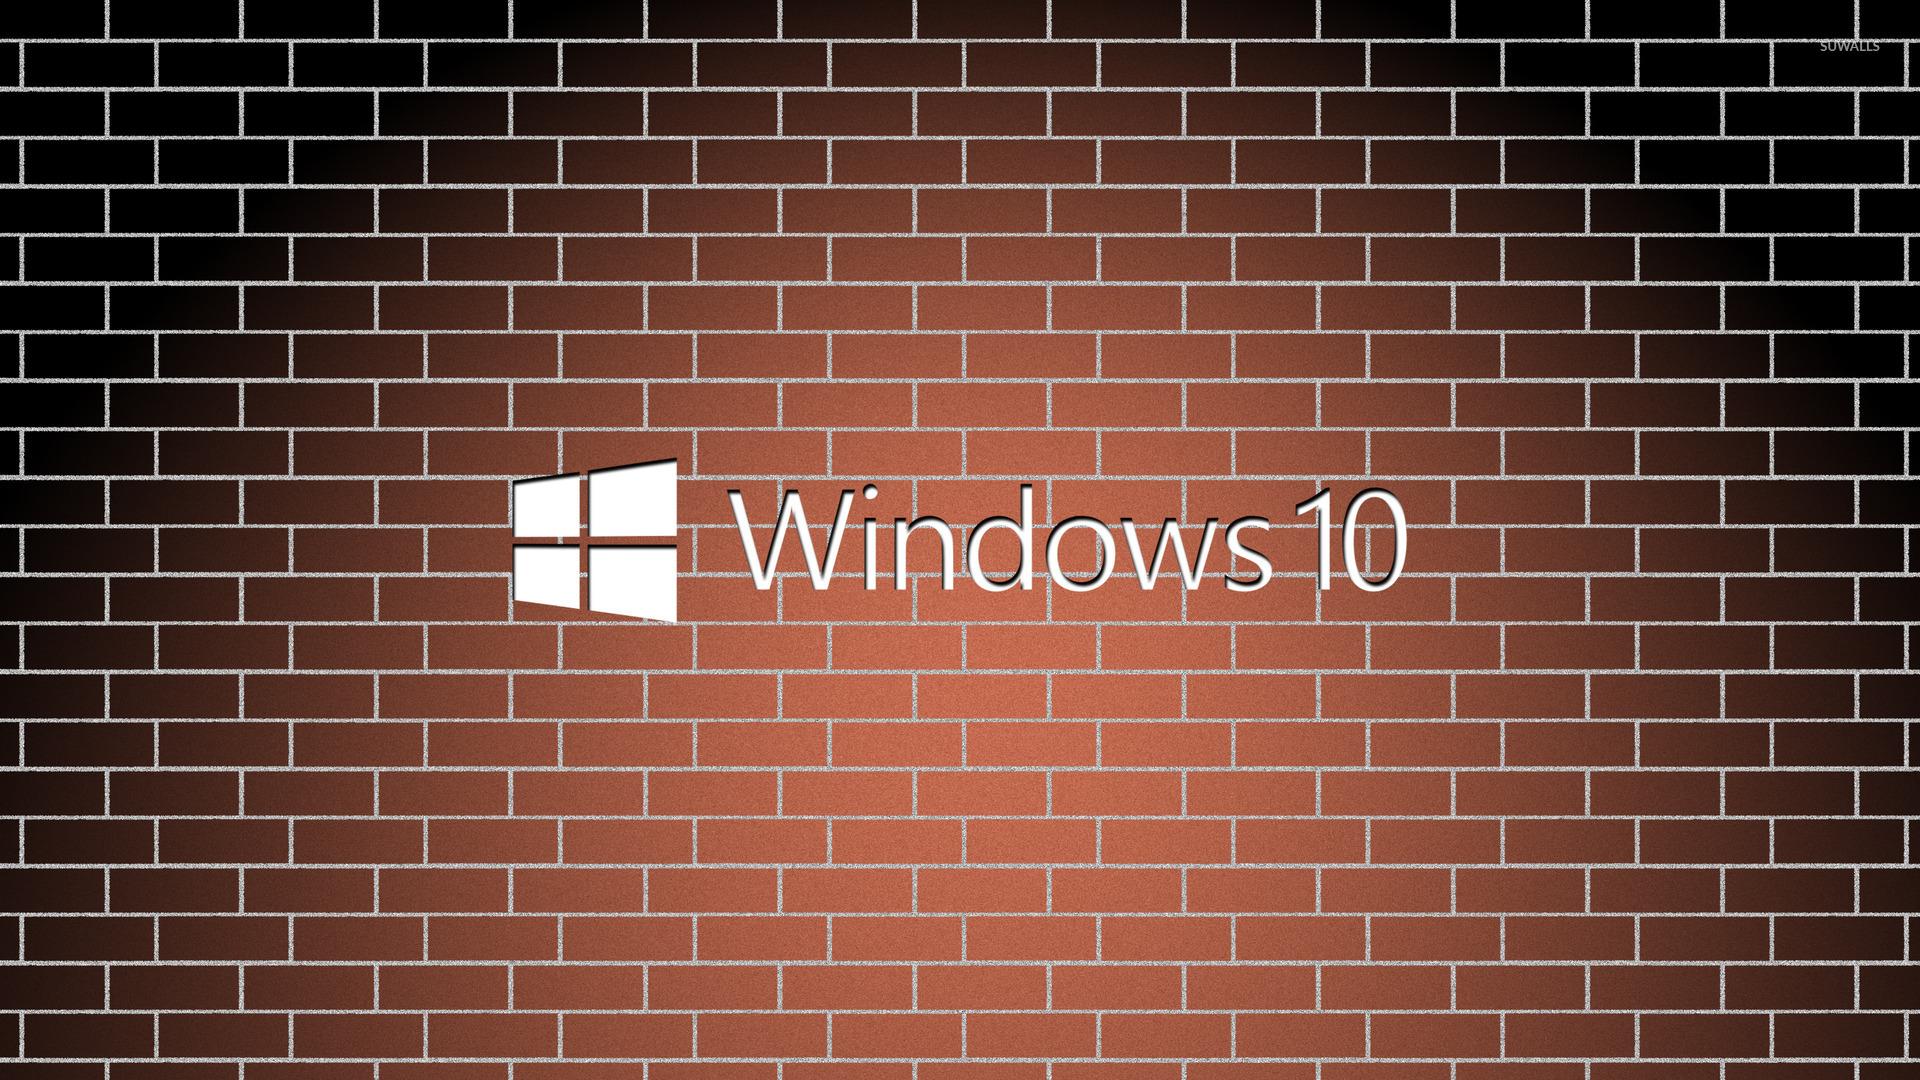 Fall Autumn Computer Wallpaper Windows 10 White Text Logo On A Brick Wall Wallpaper